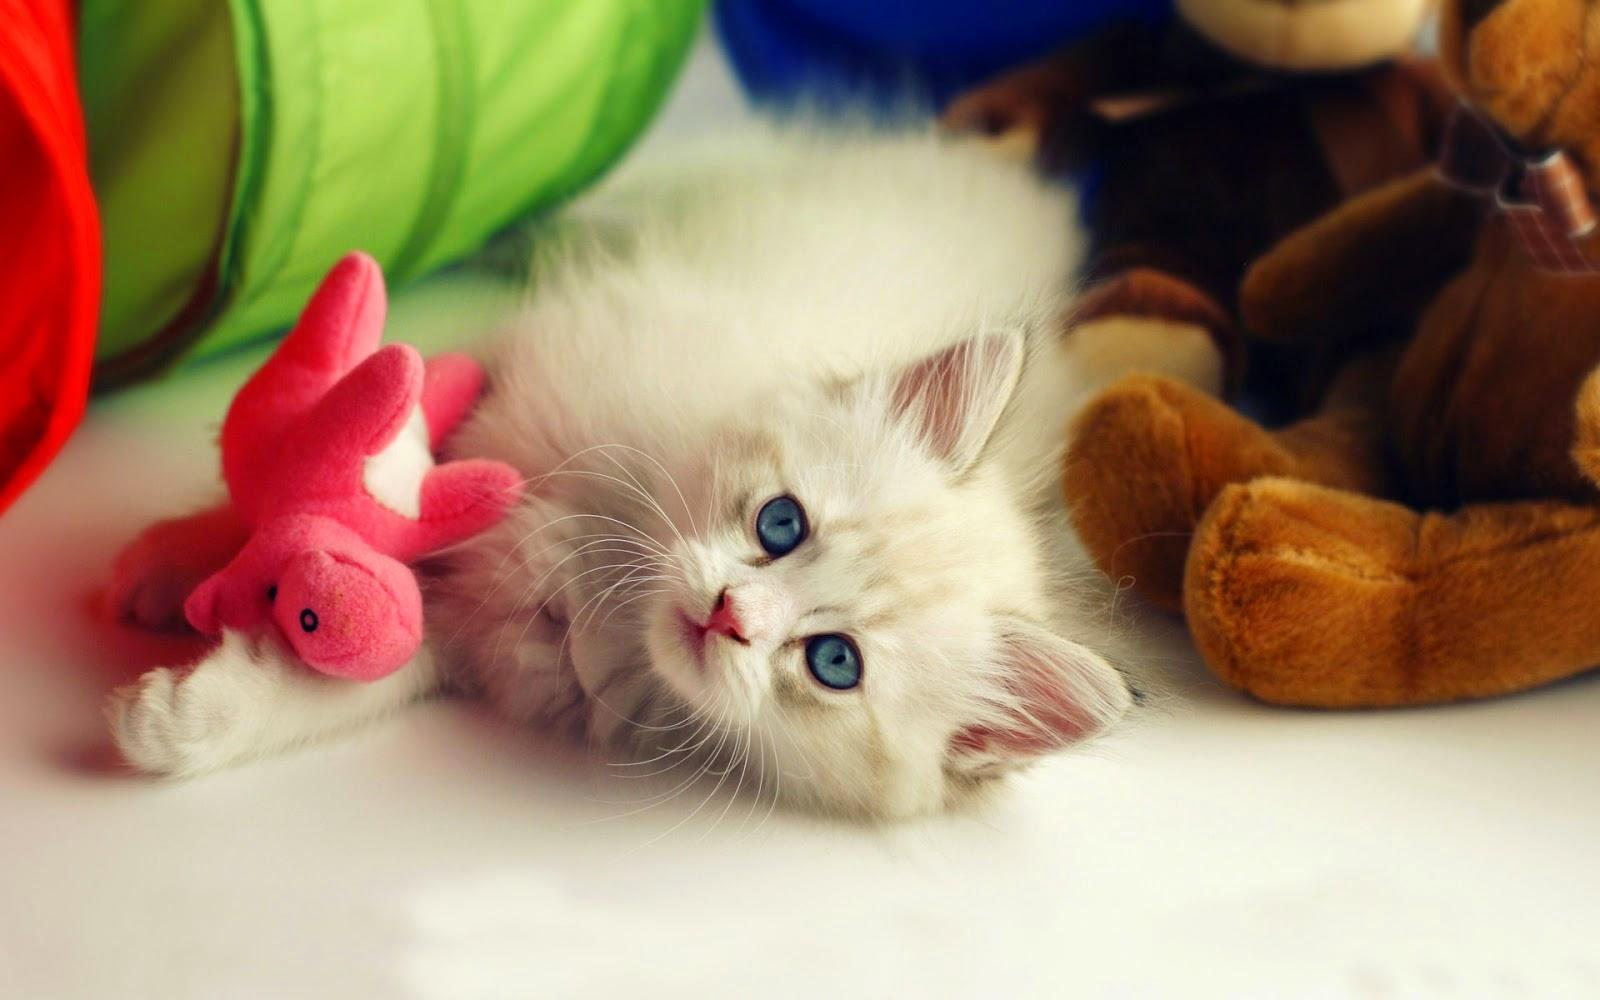 M o con p v i nh ng nh n n m o con d th ng h nh nh - Cute kittens hd wallpaper free download ...